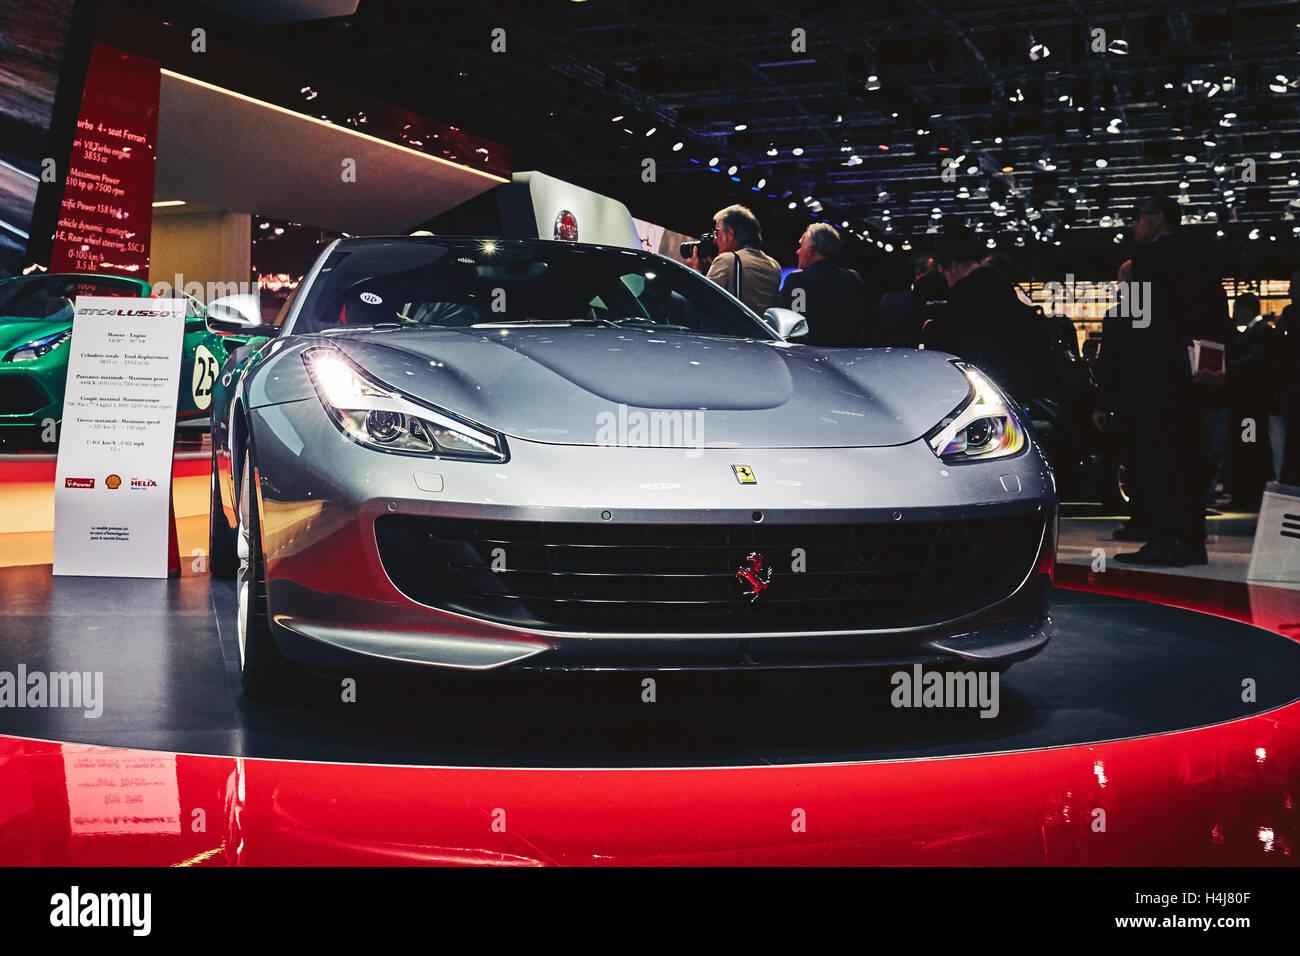 Ferrari Gtc15 Lusso Fotos e Imágenes de stock - Alamy